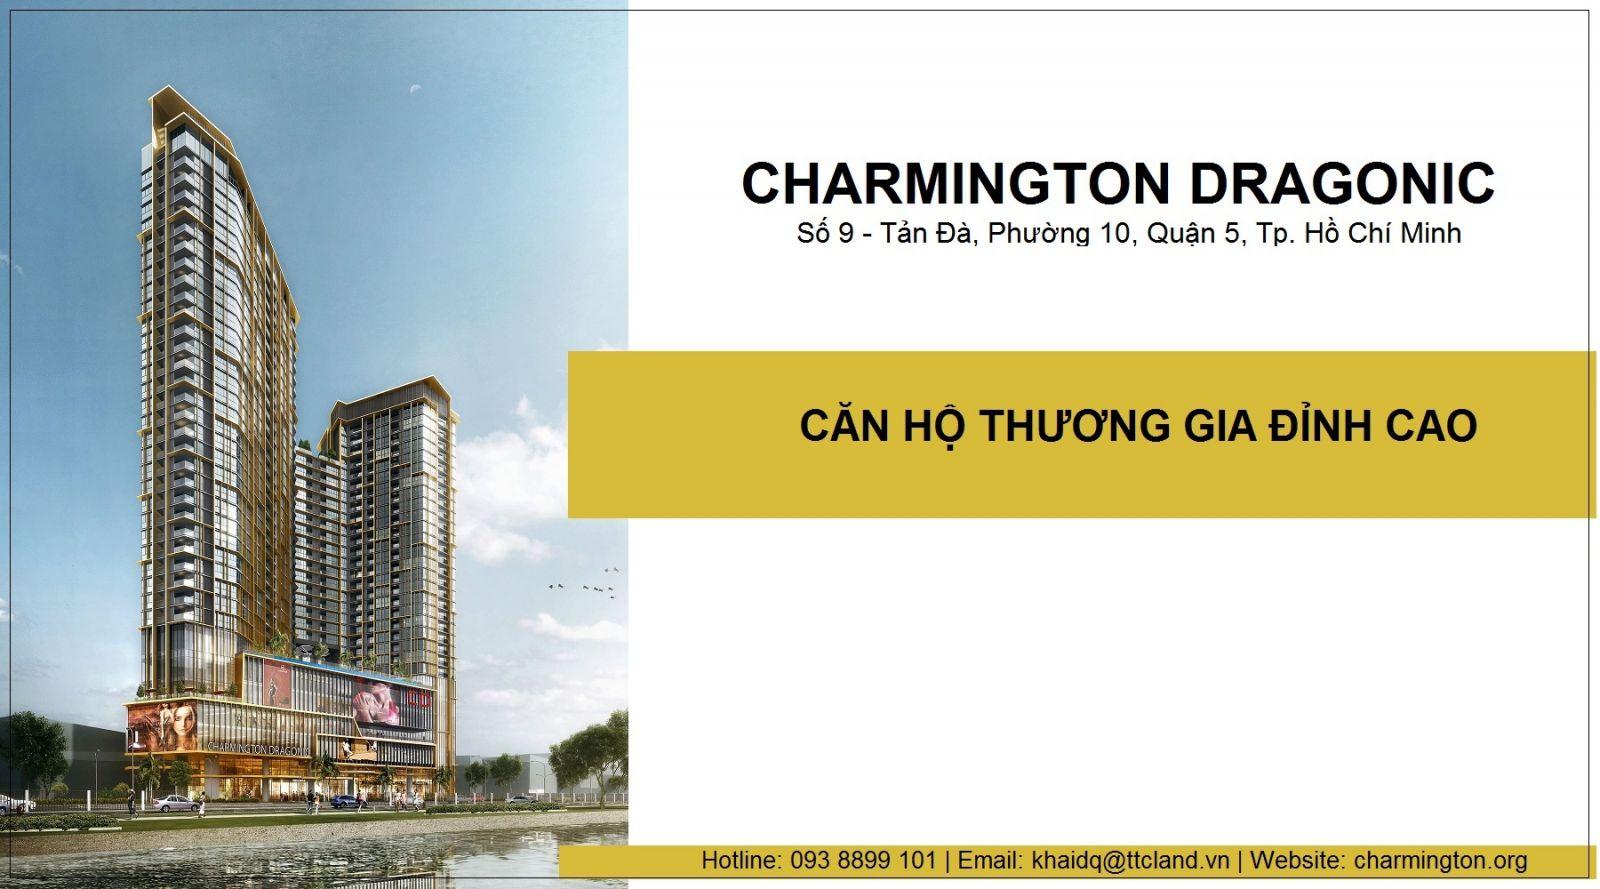 PHOI CANH CHARMINGTON DRAGONIC QUAN 5